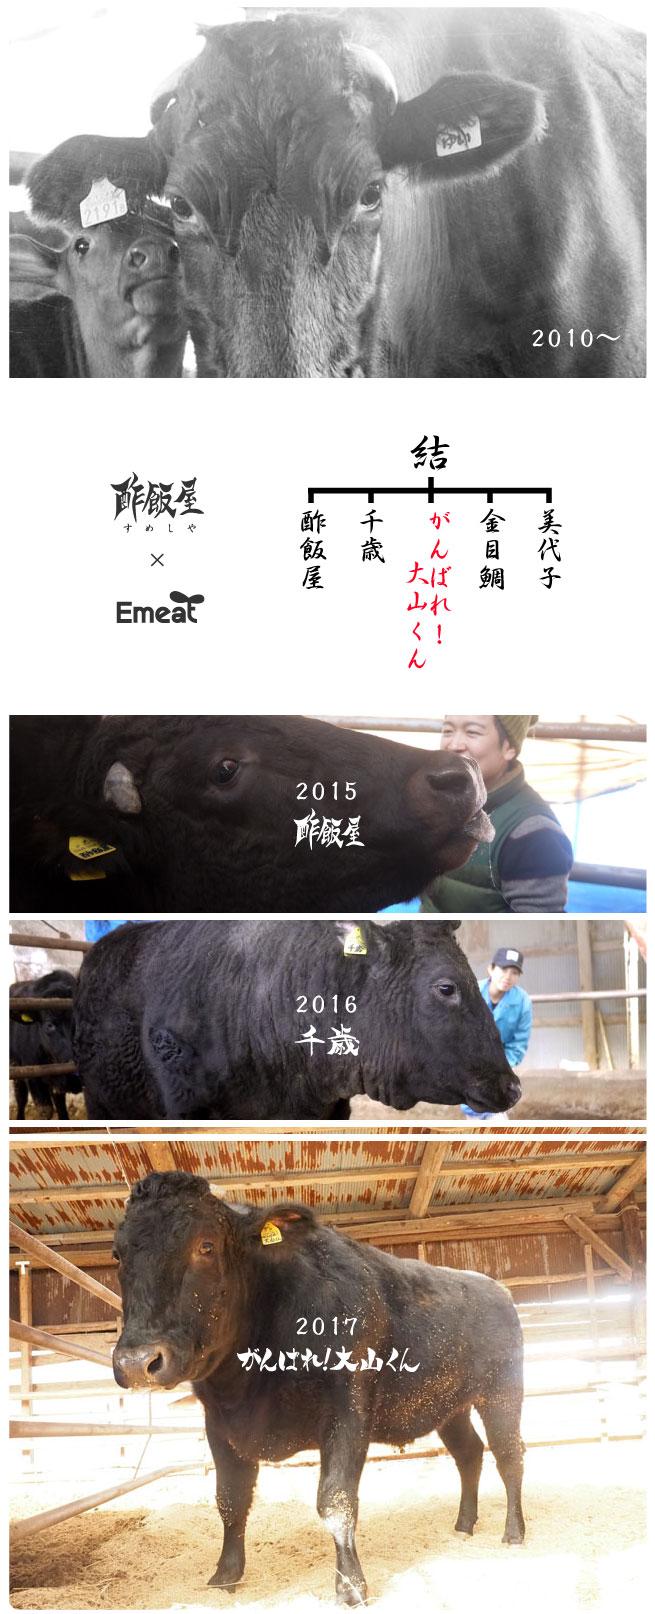 Emeat-blog-ooyama-21.jpg